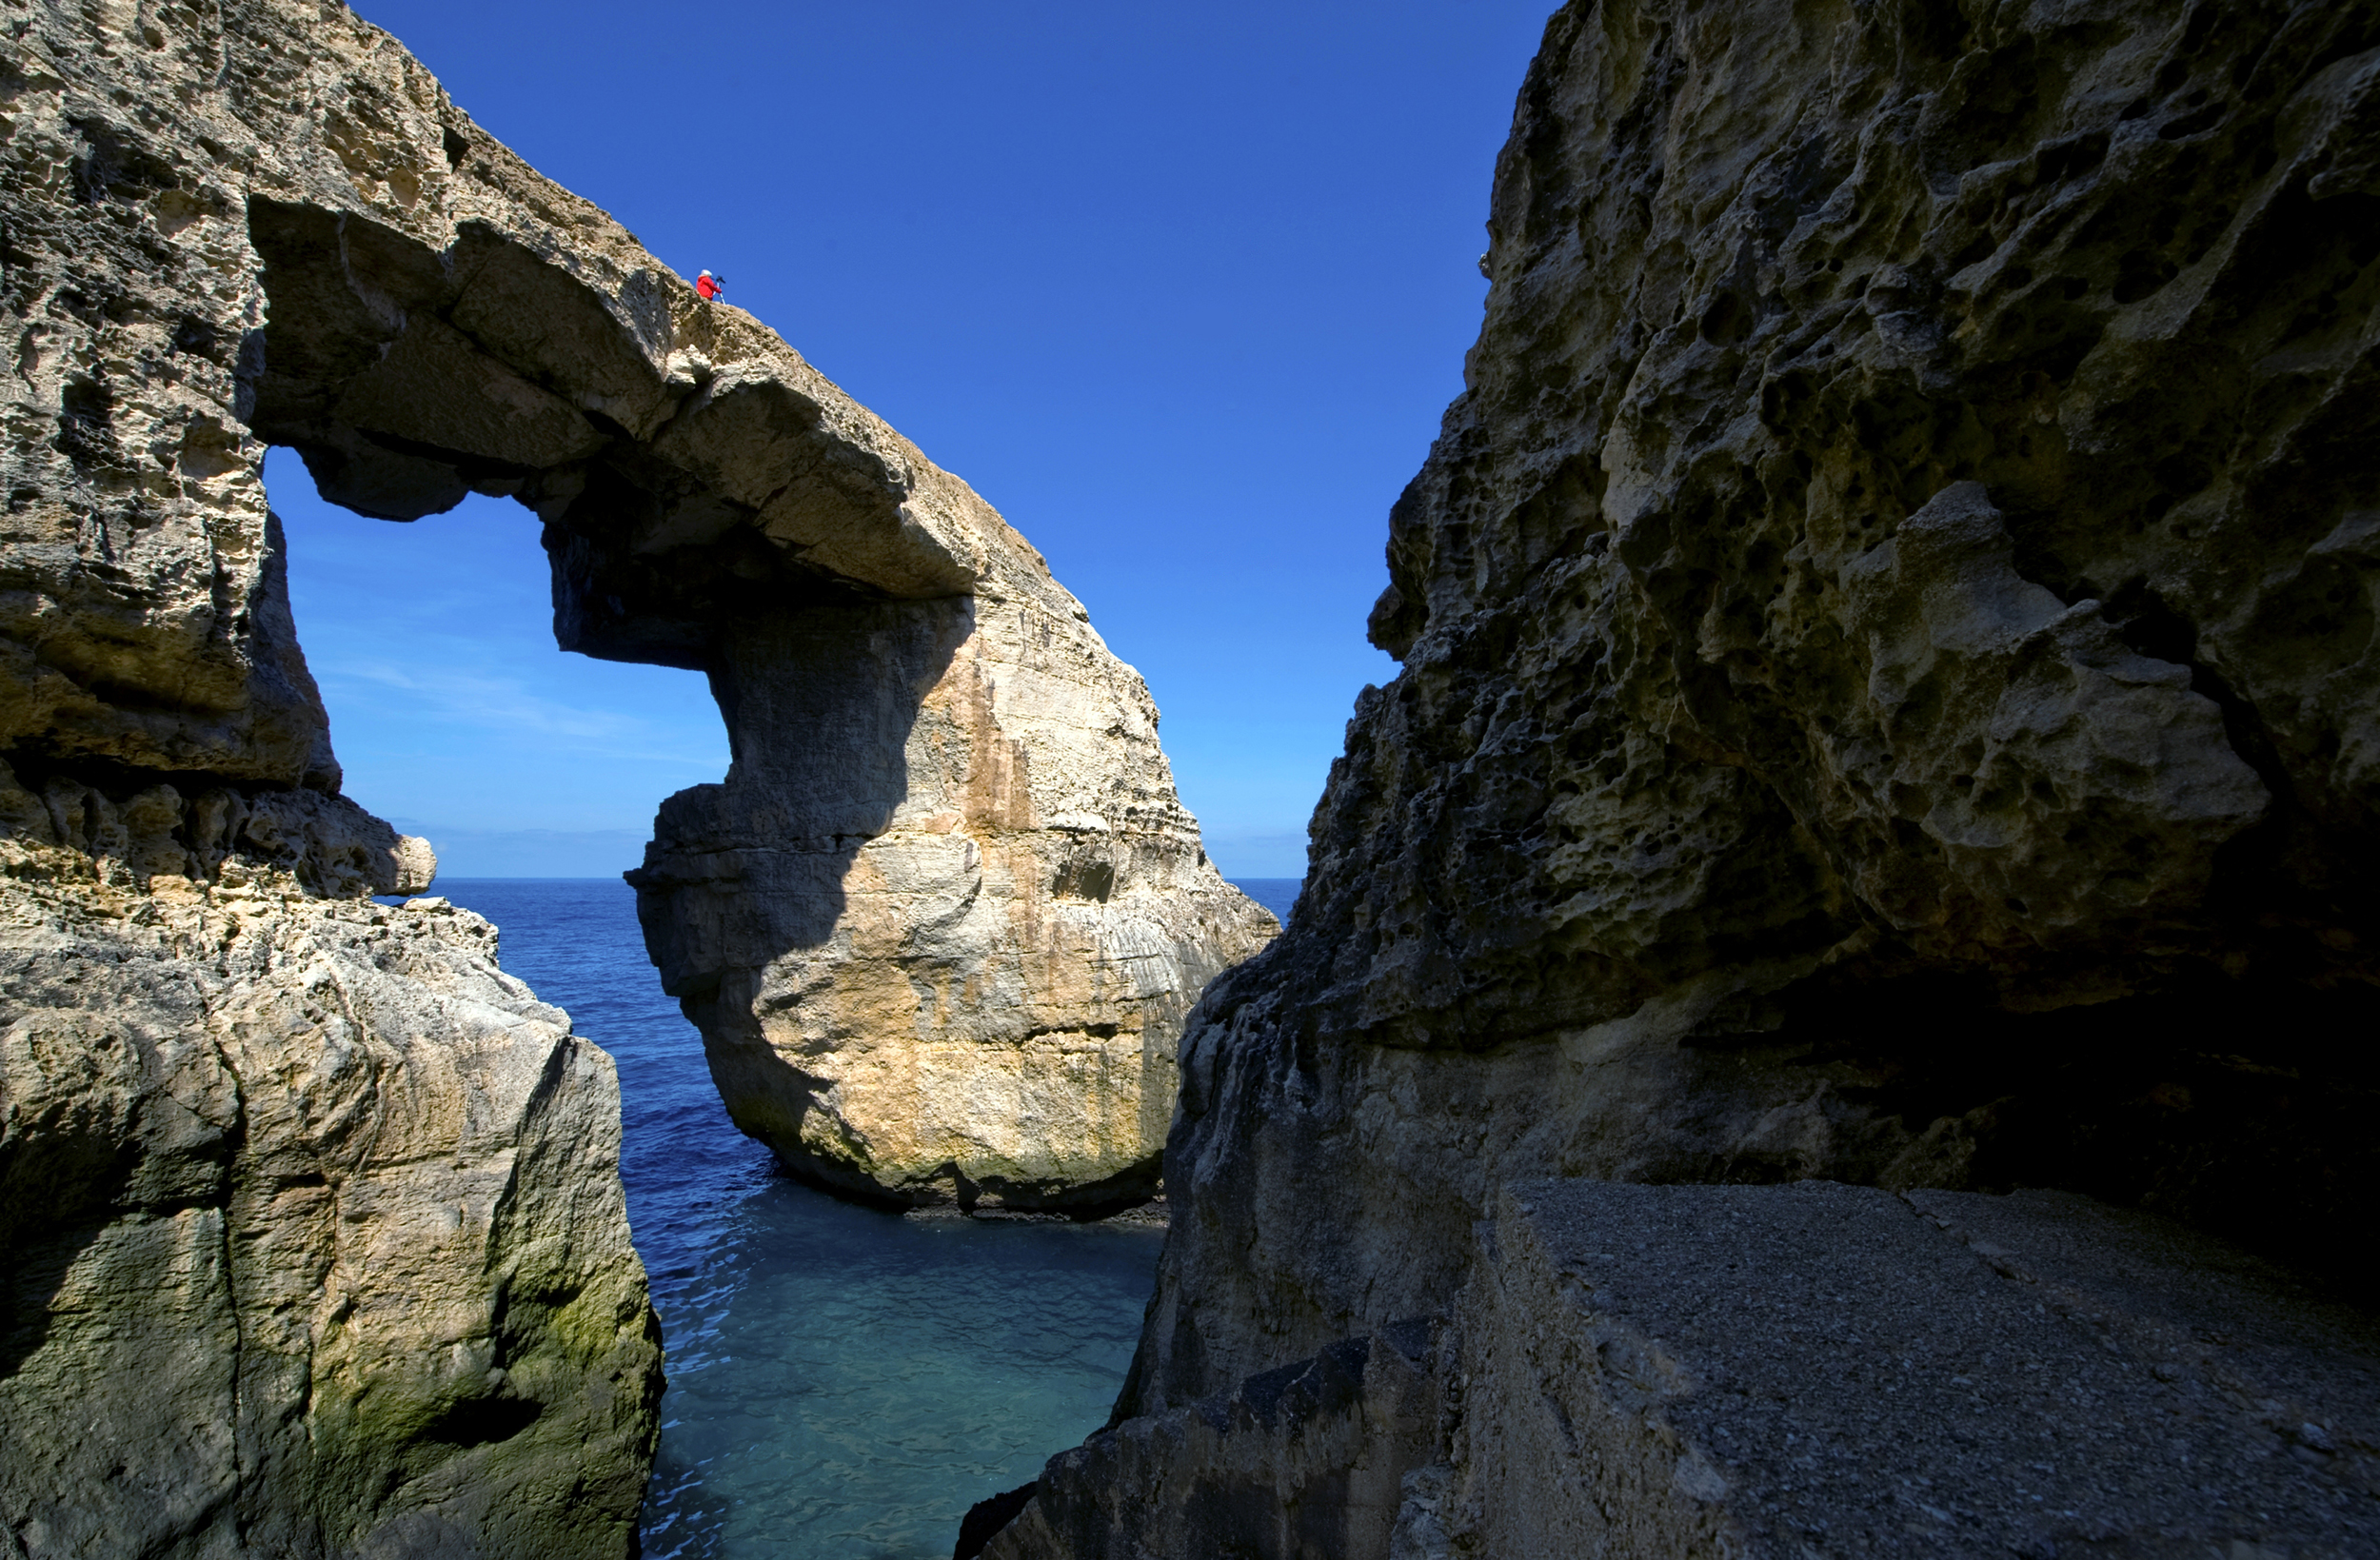 Wied il miela atlantis gozo for Gozo dive centres